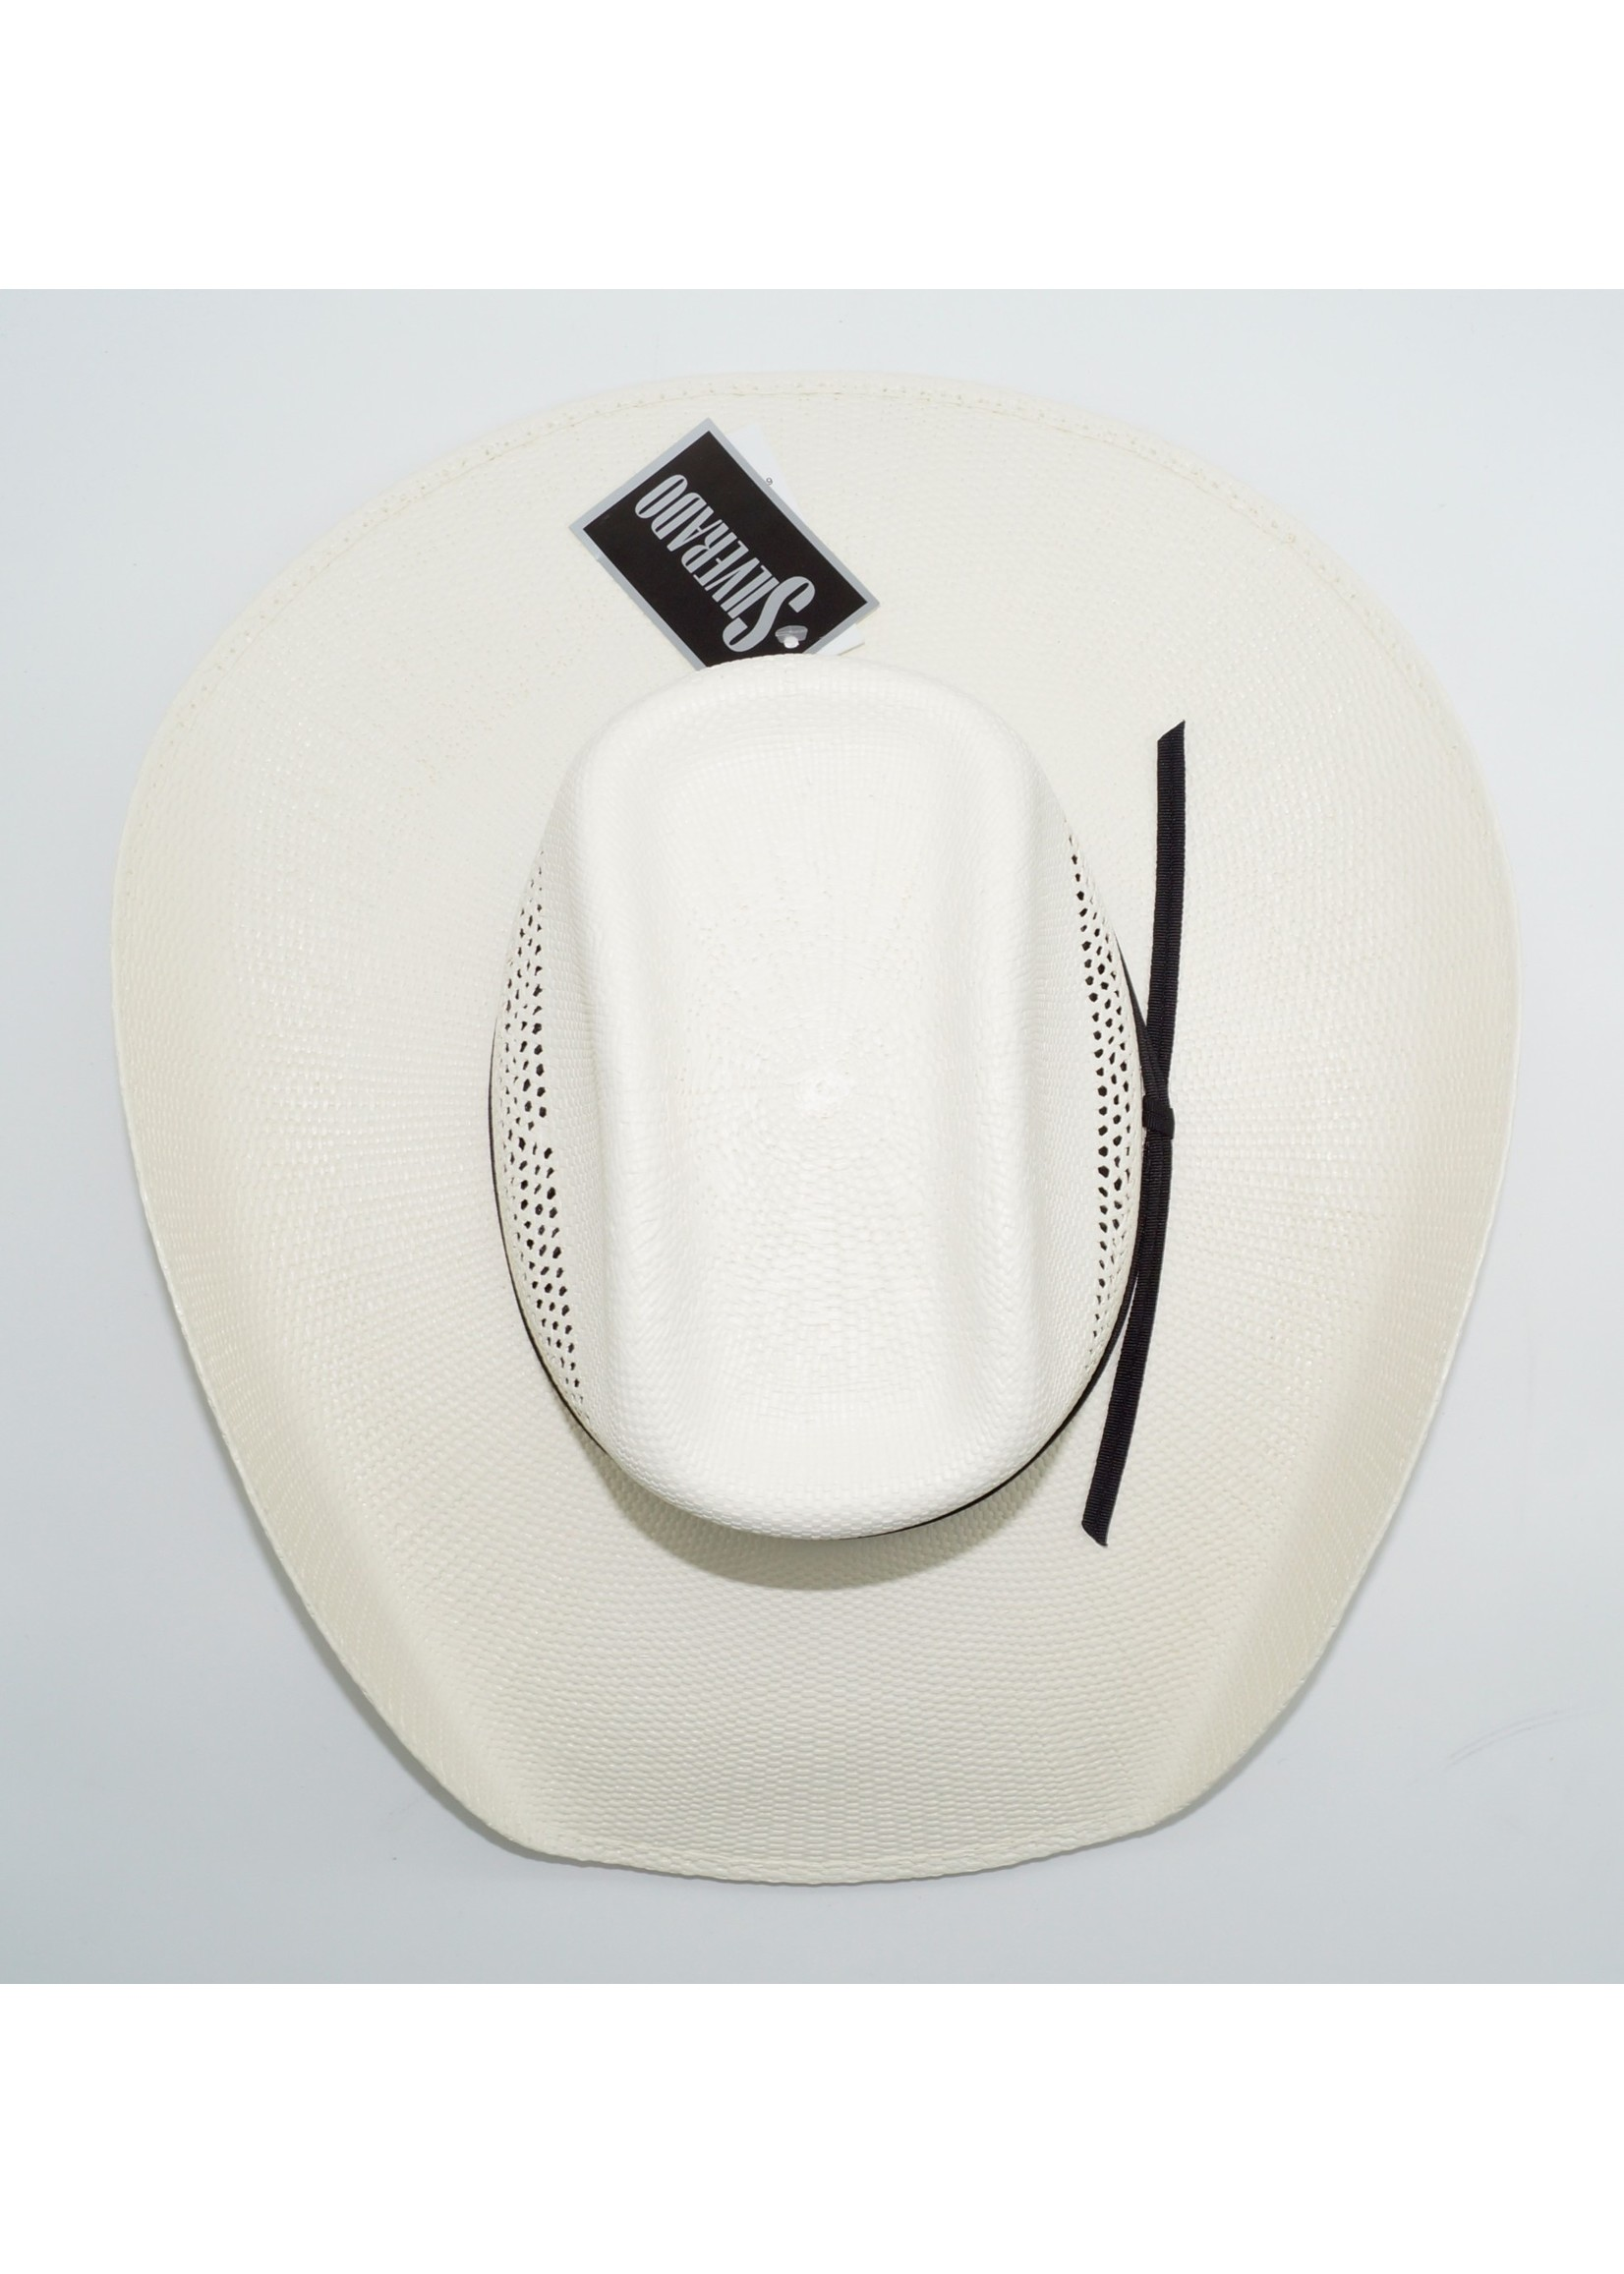 F&M Broken Road /Cattleman Crease/ Ivory Color